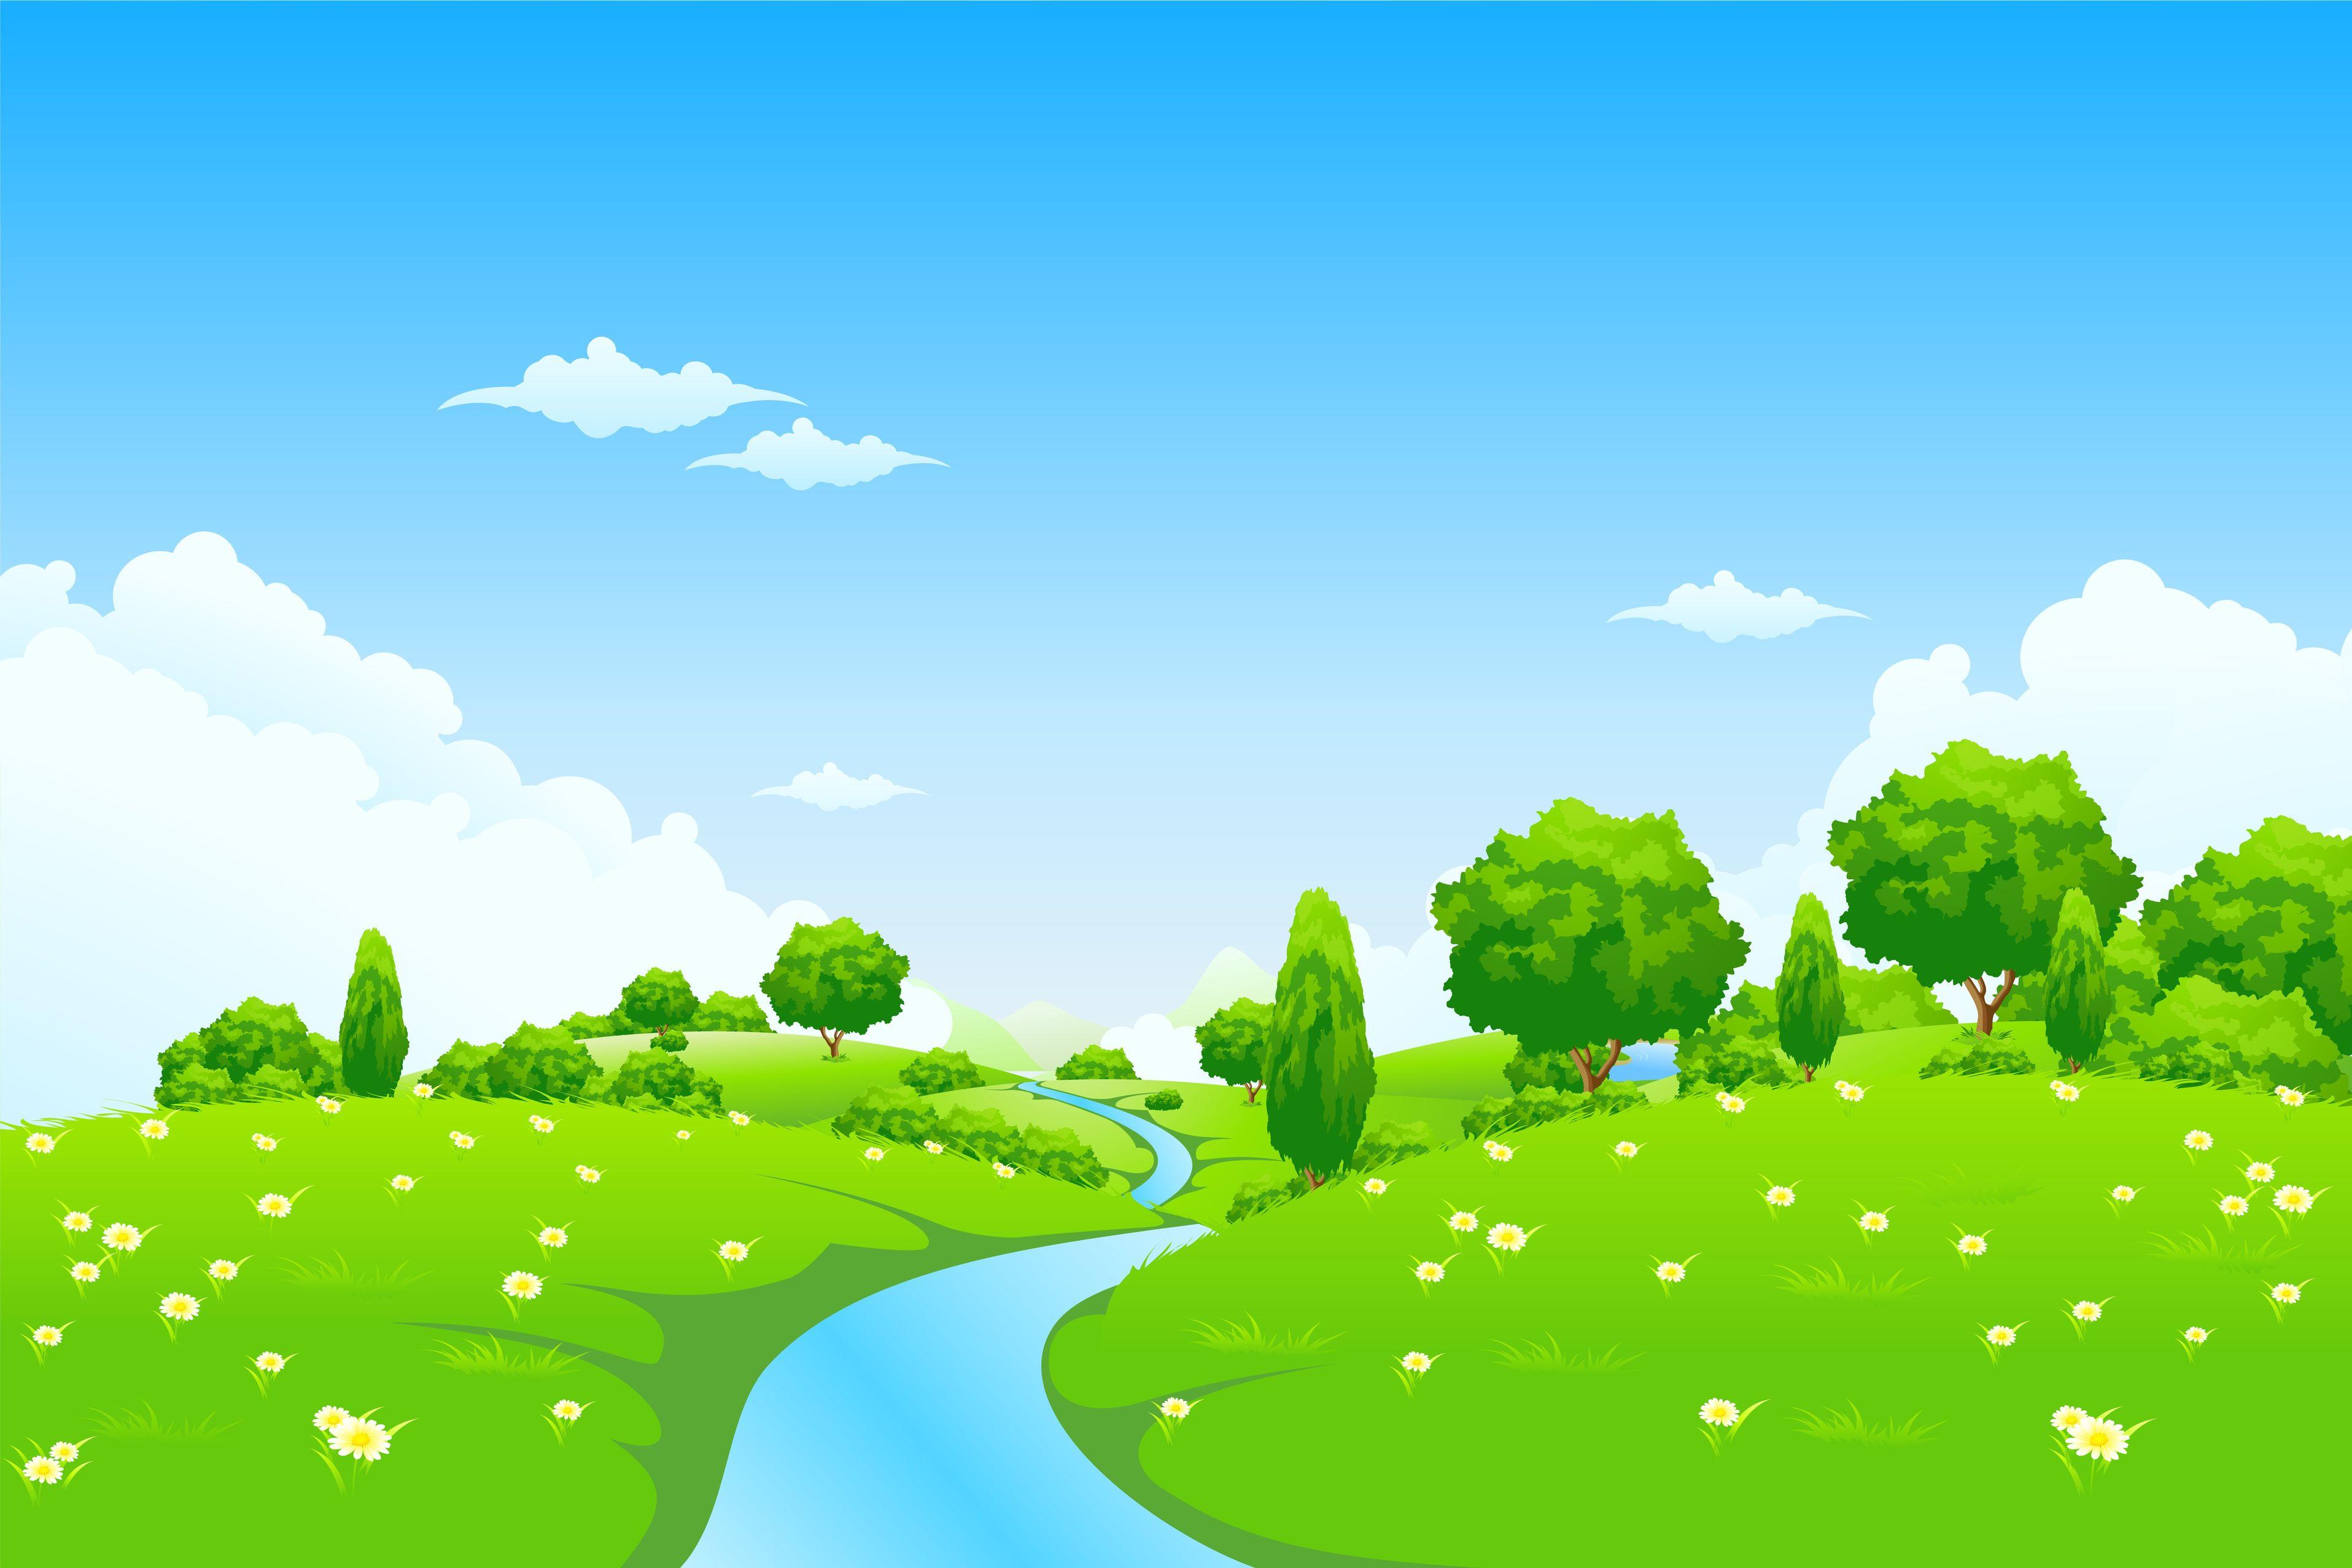 River background clipart svg freeuse River background clipart - ClipartFest svg freeuse